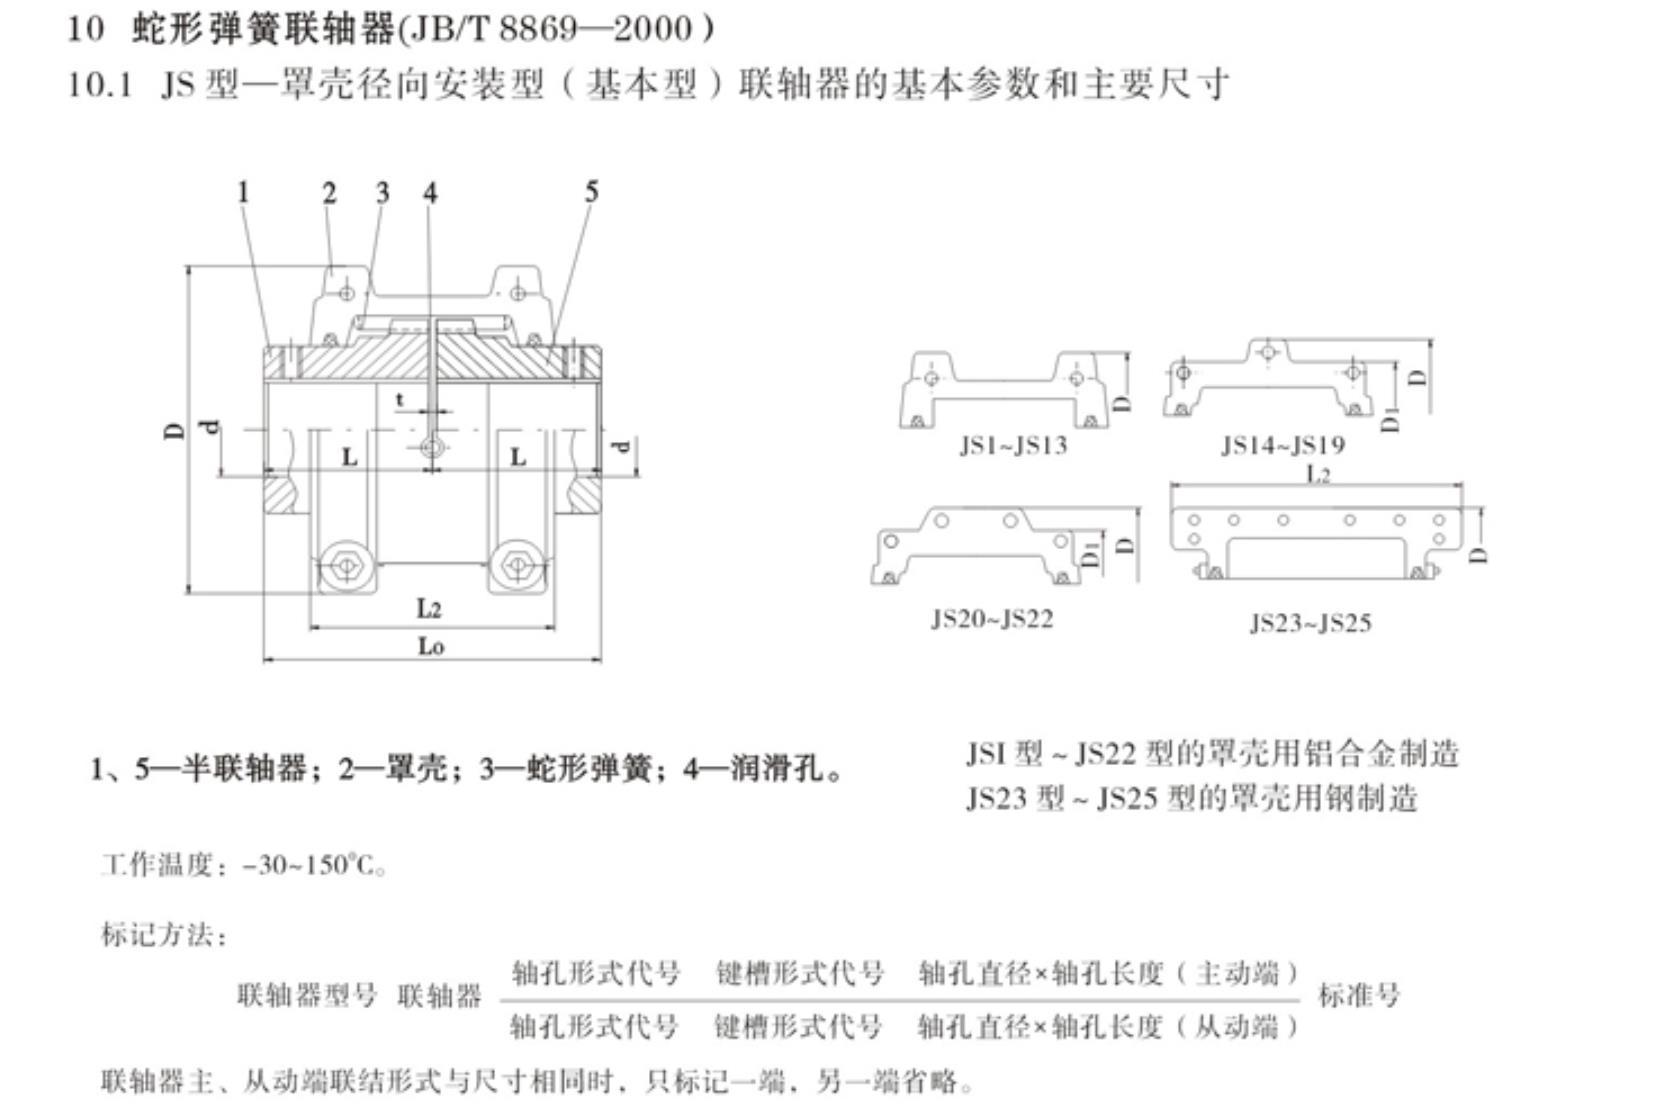 JS蛇形弹簧联轴器尺寸国标图纸